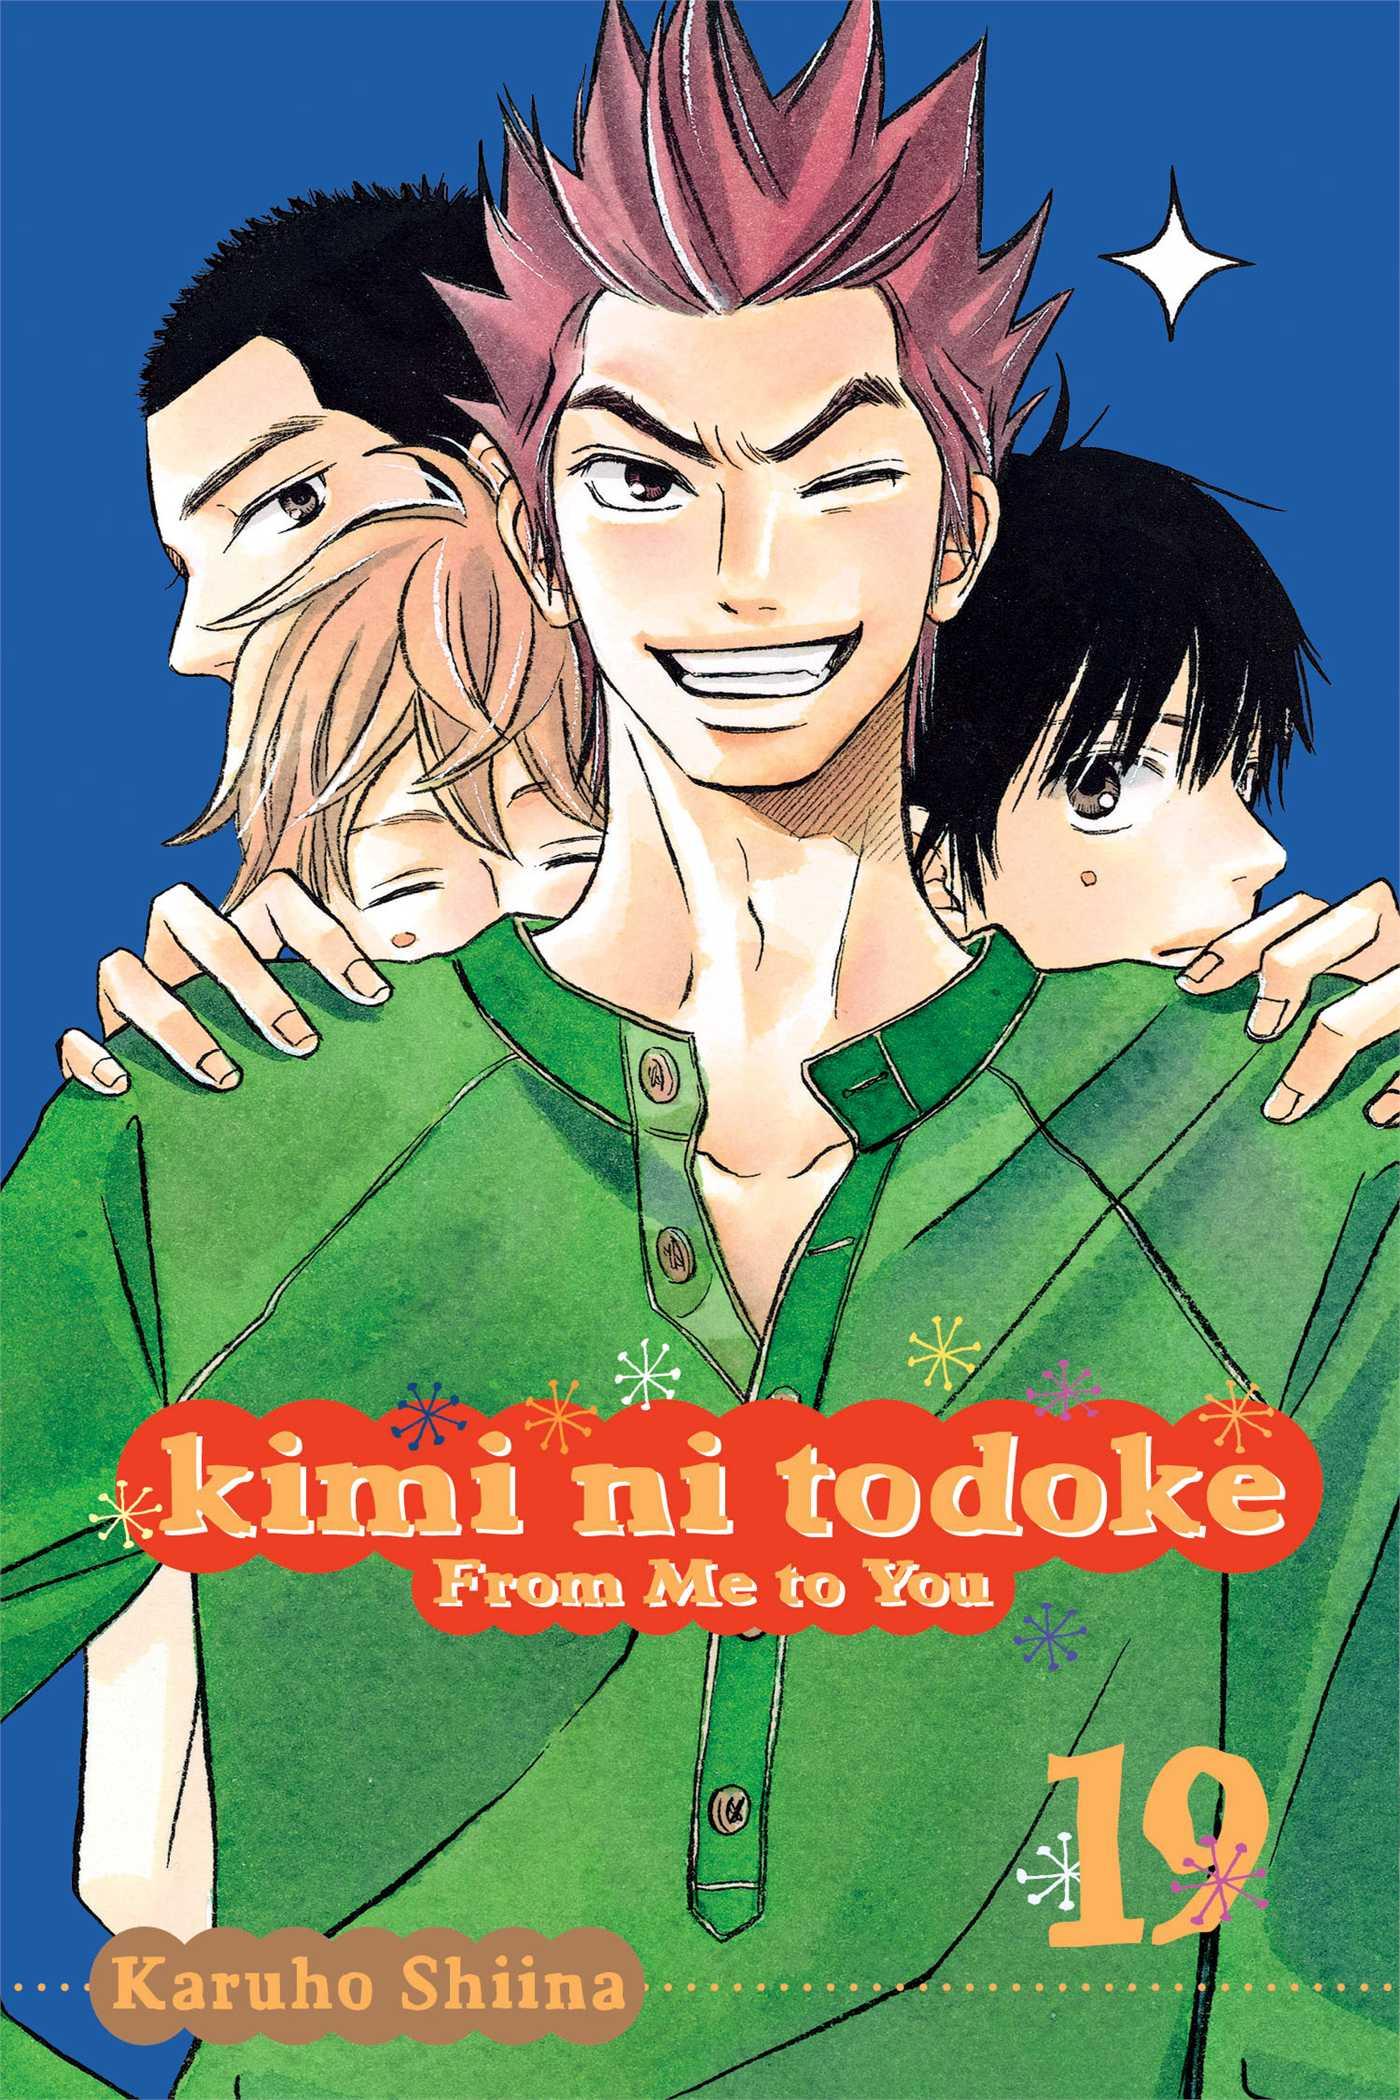 Kimi ni todoke from me to you vol 19 9781421567808 hr